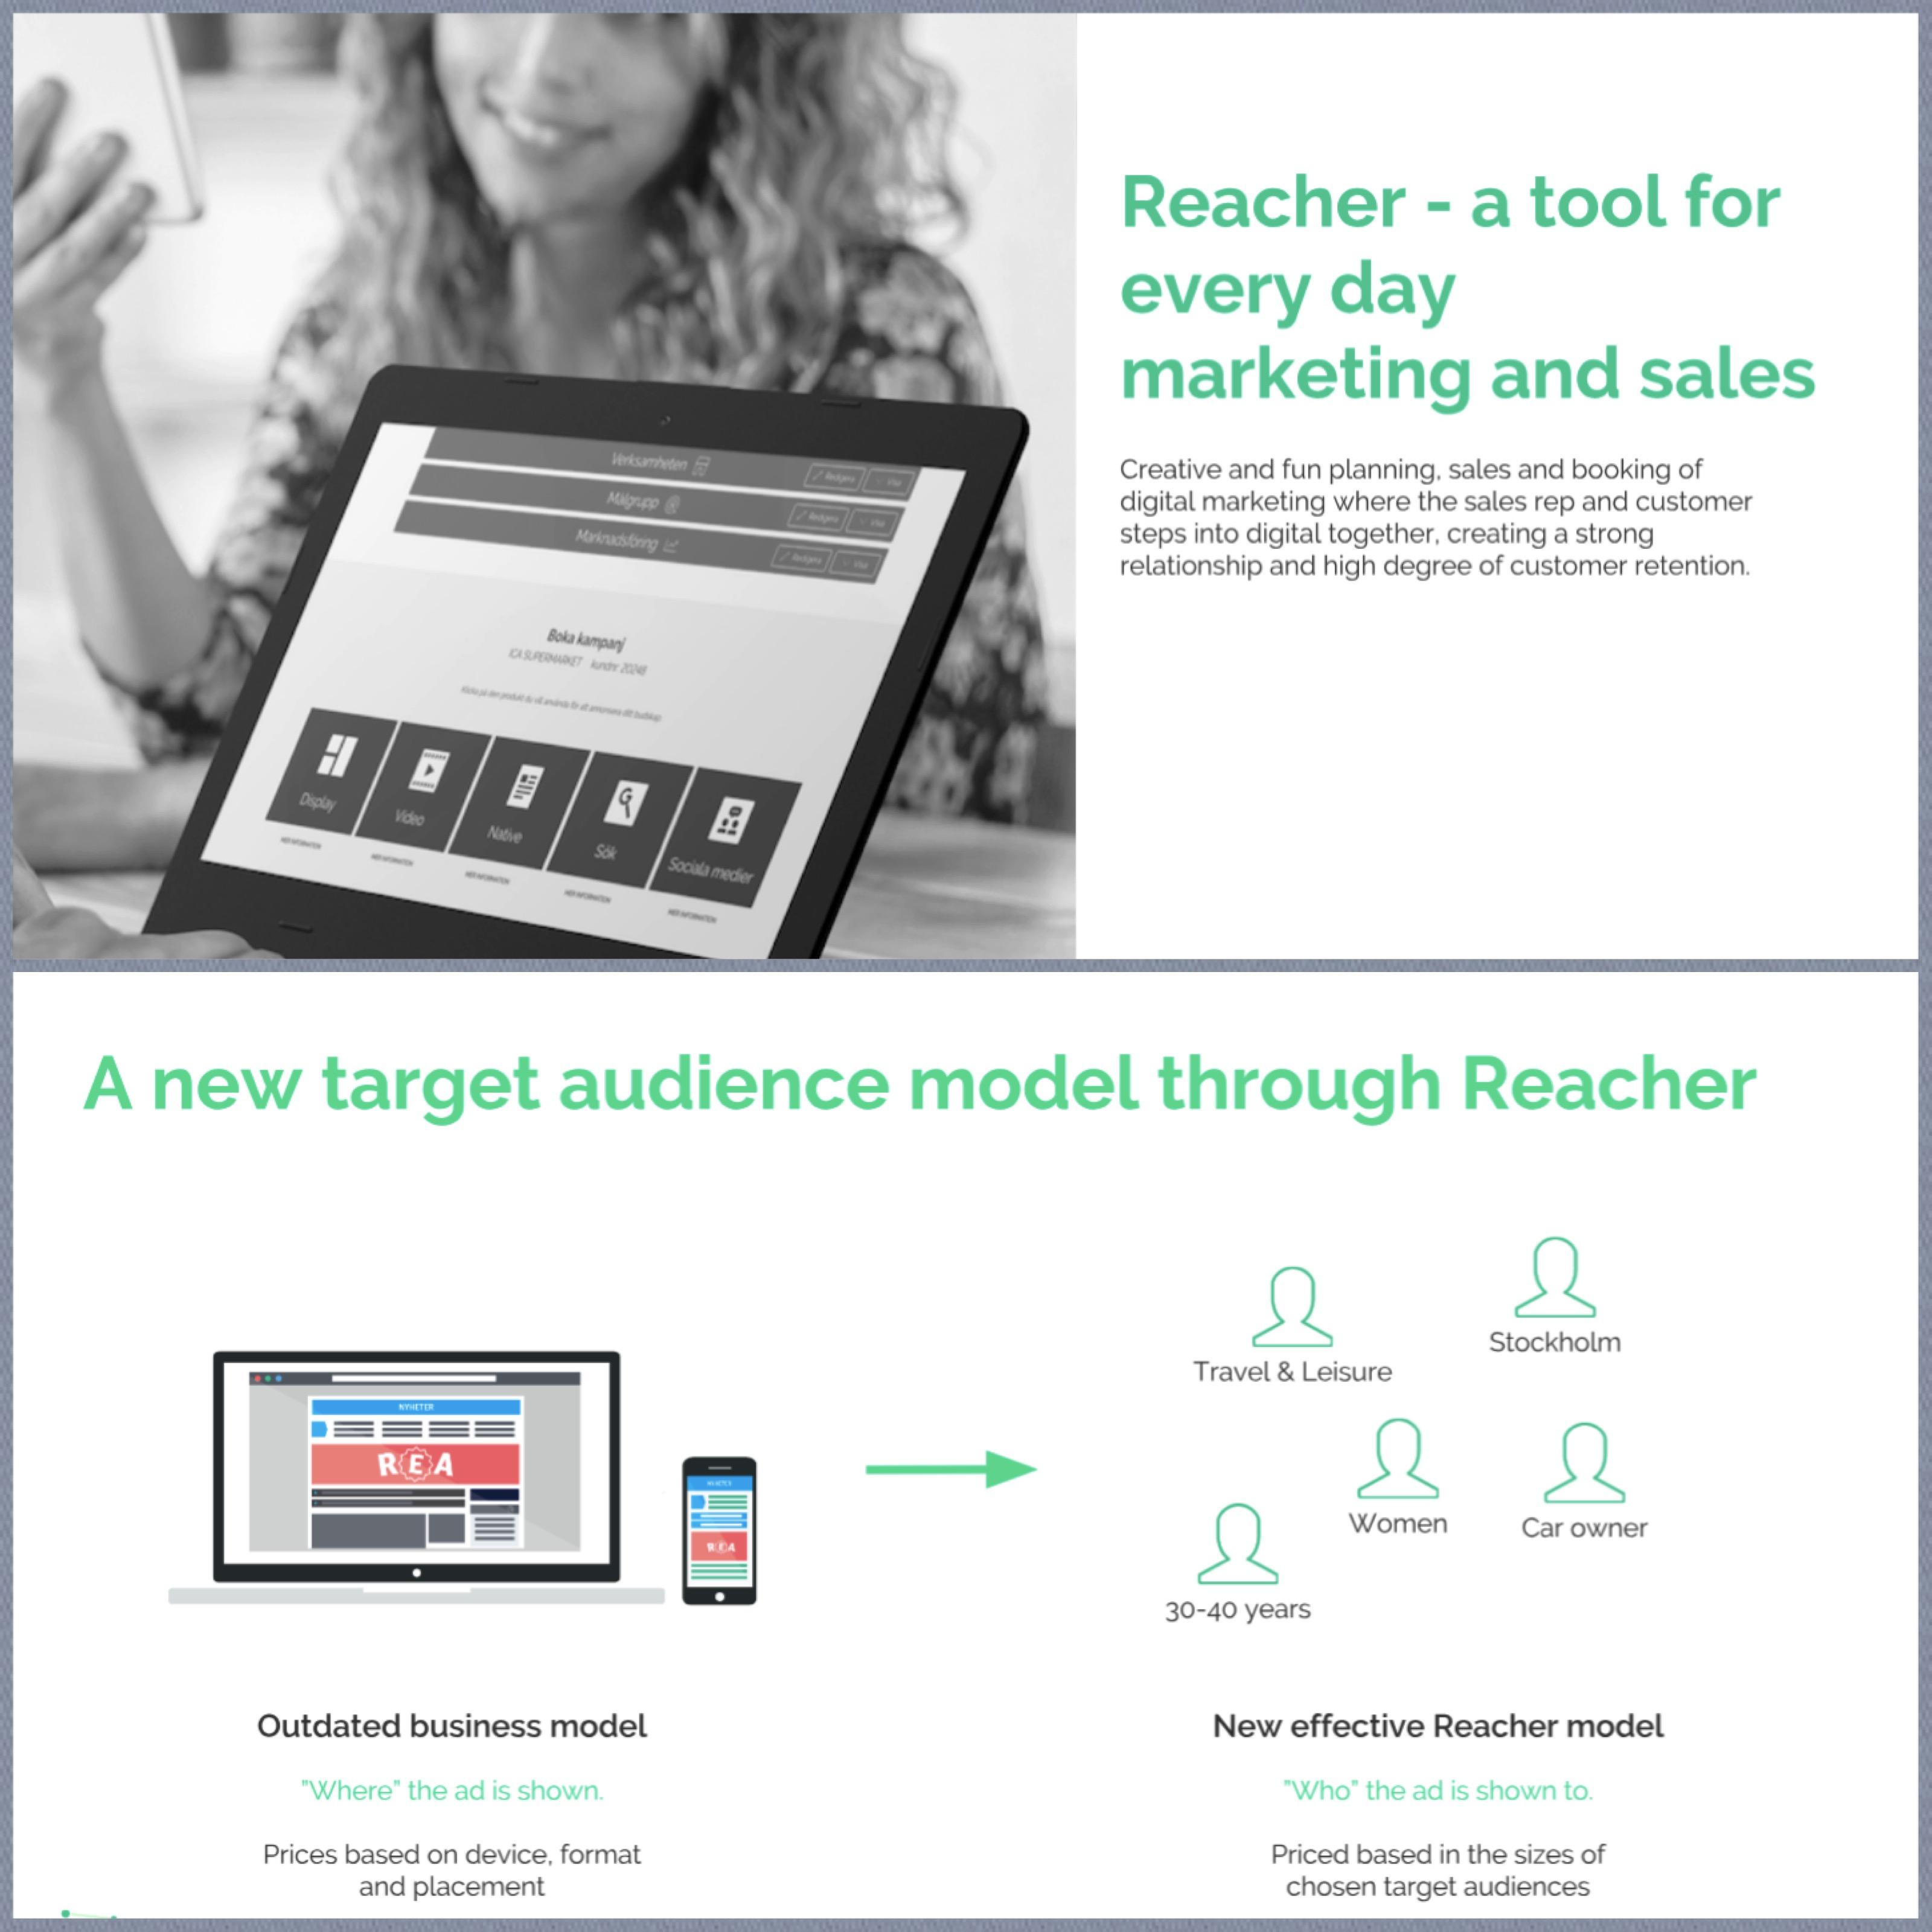 INMA: Best Practice - The Mittmedia Reacher Advertising